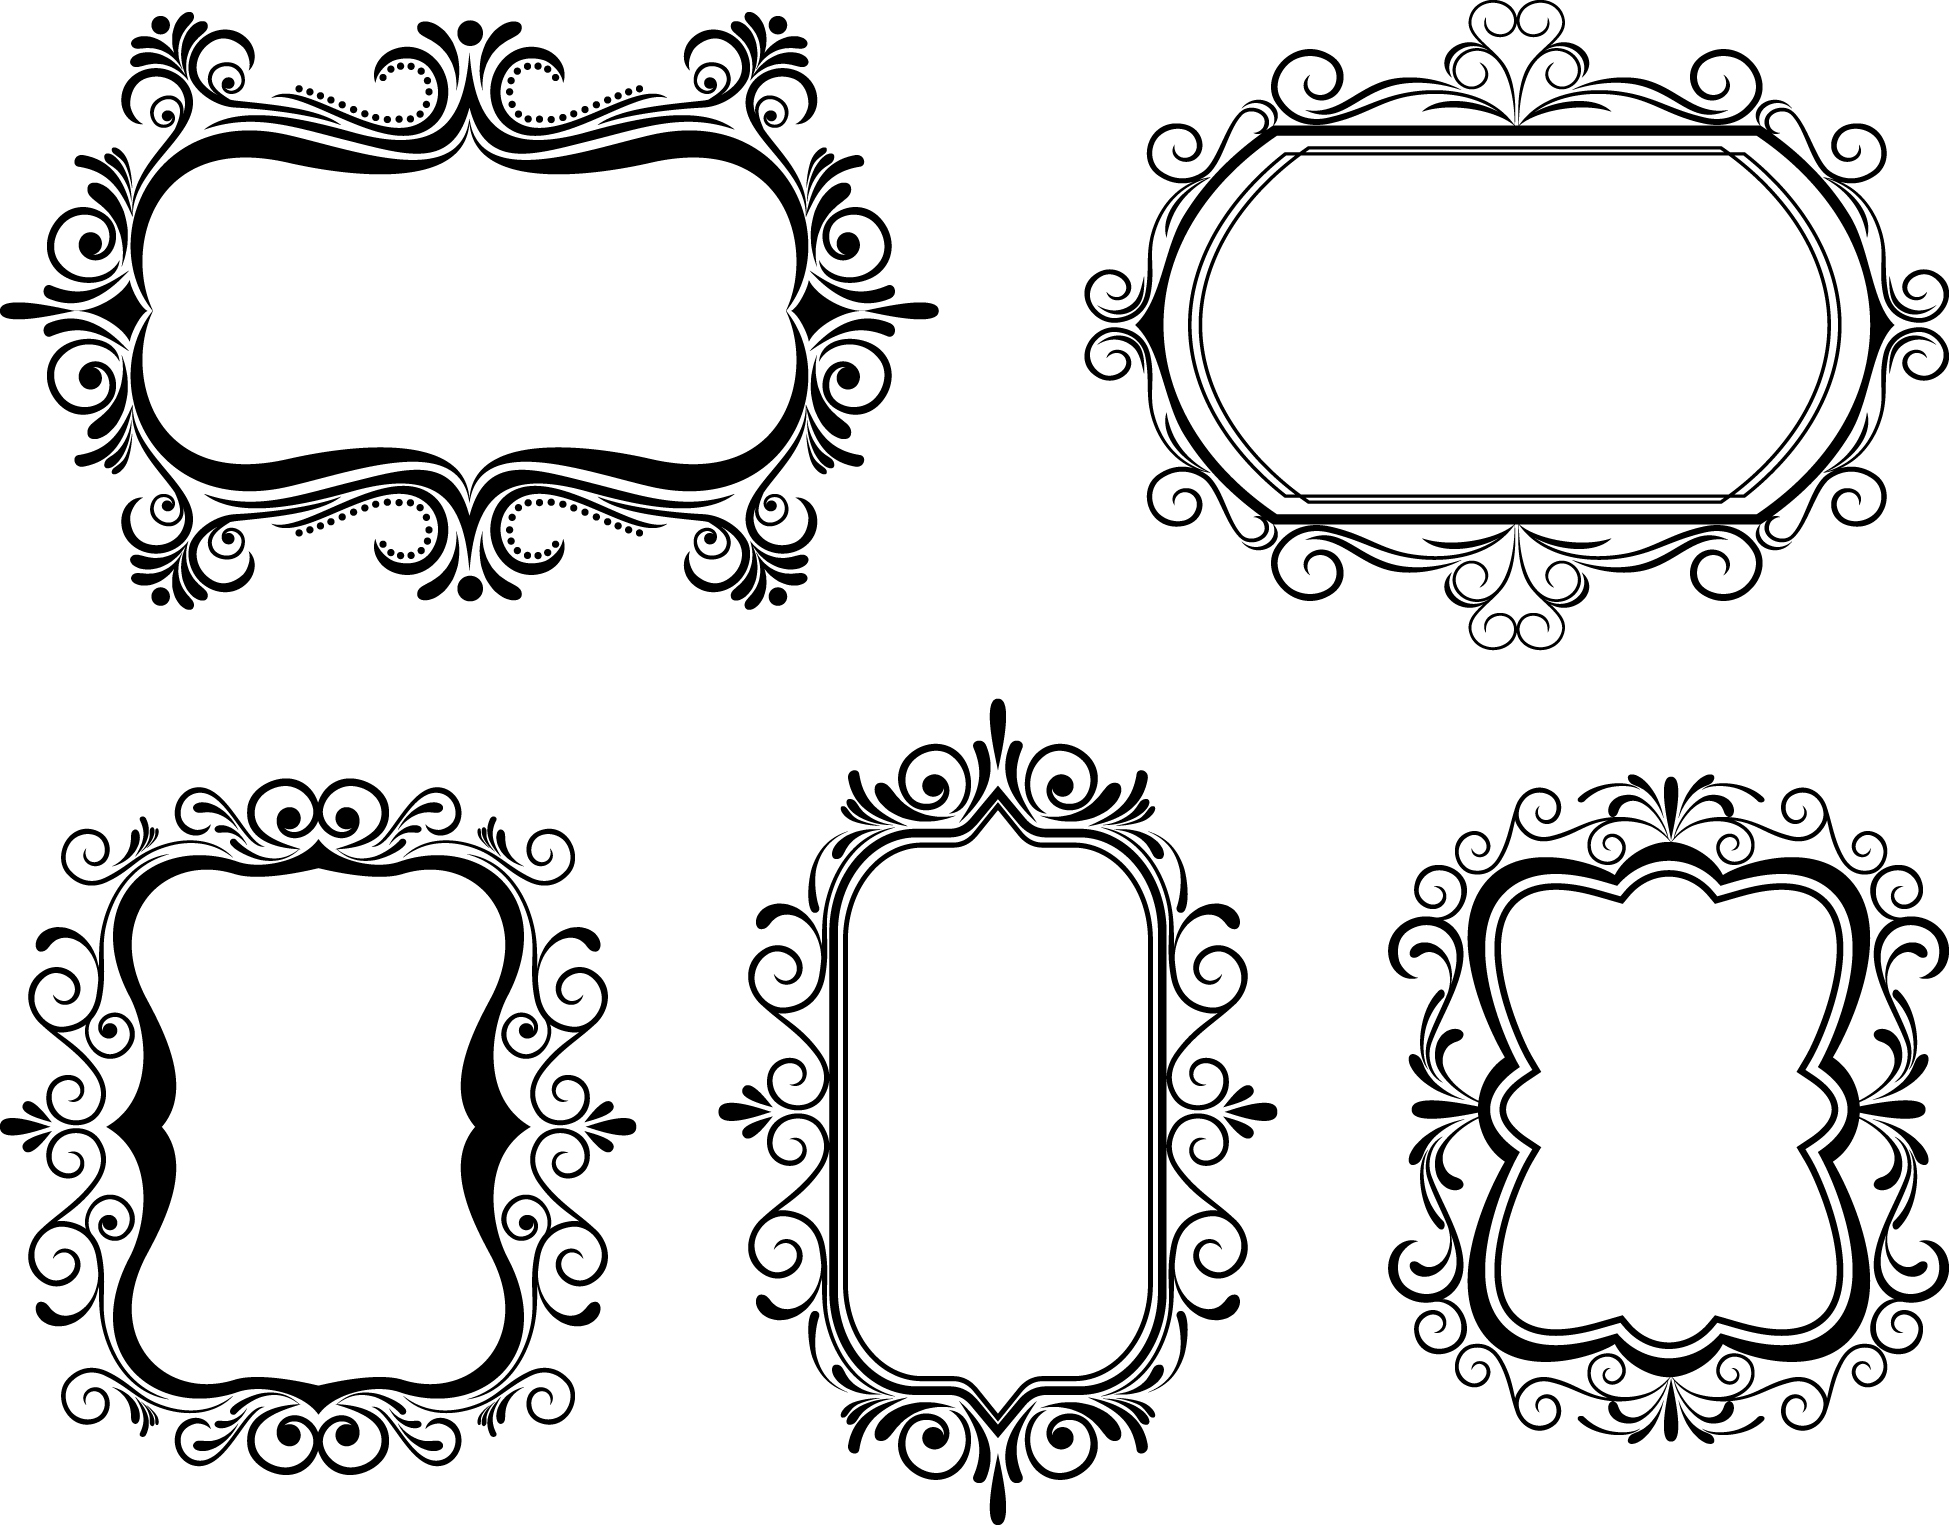 Free Vector Borders, Download Free Clip Art, Free Clip Art.